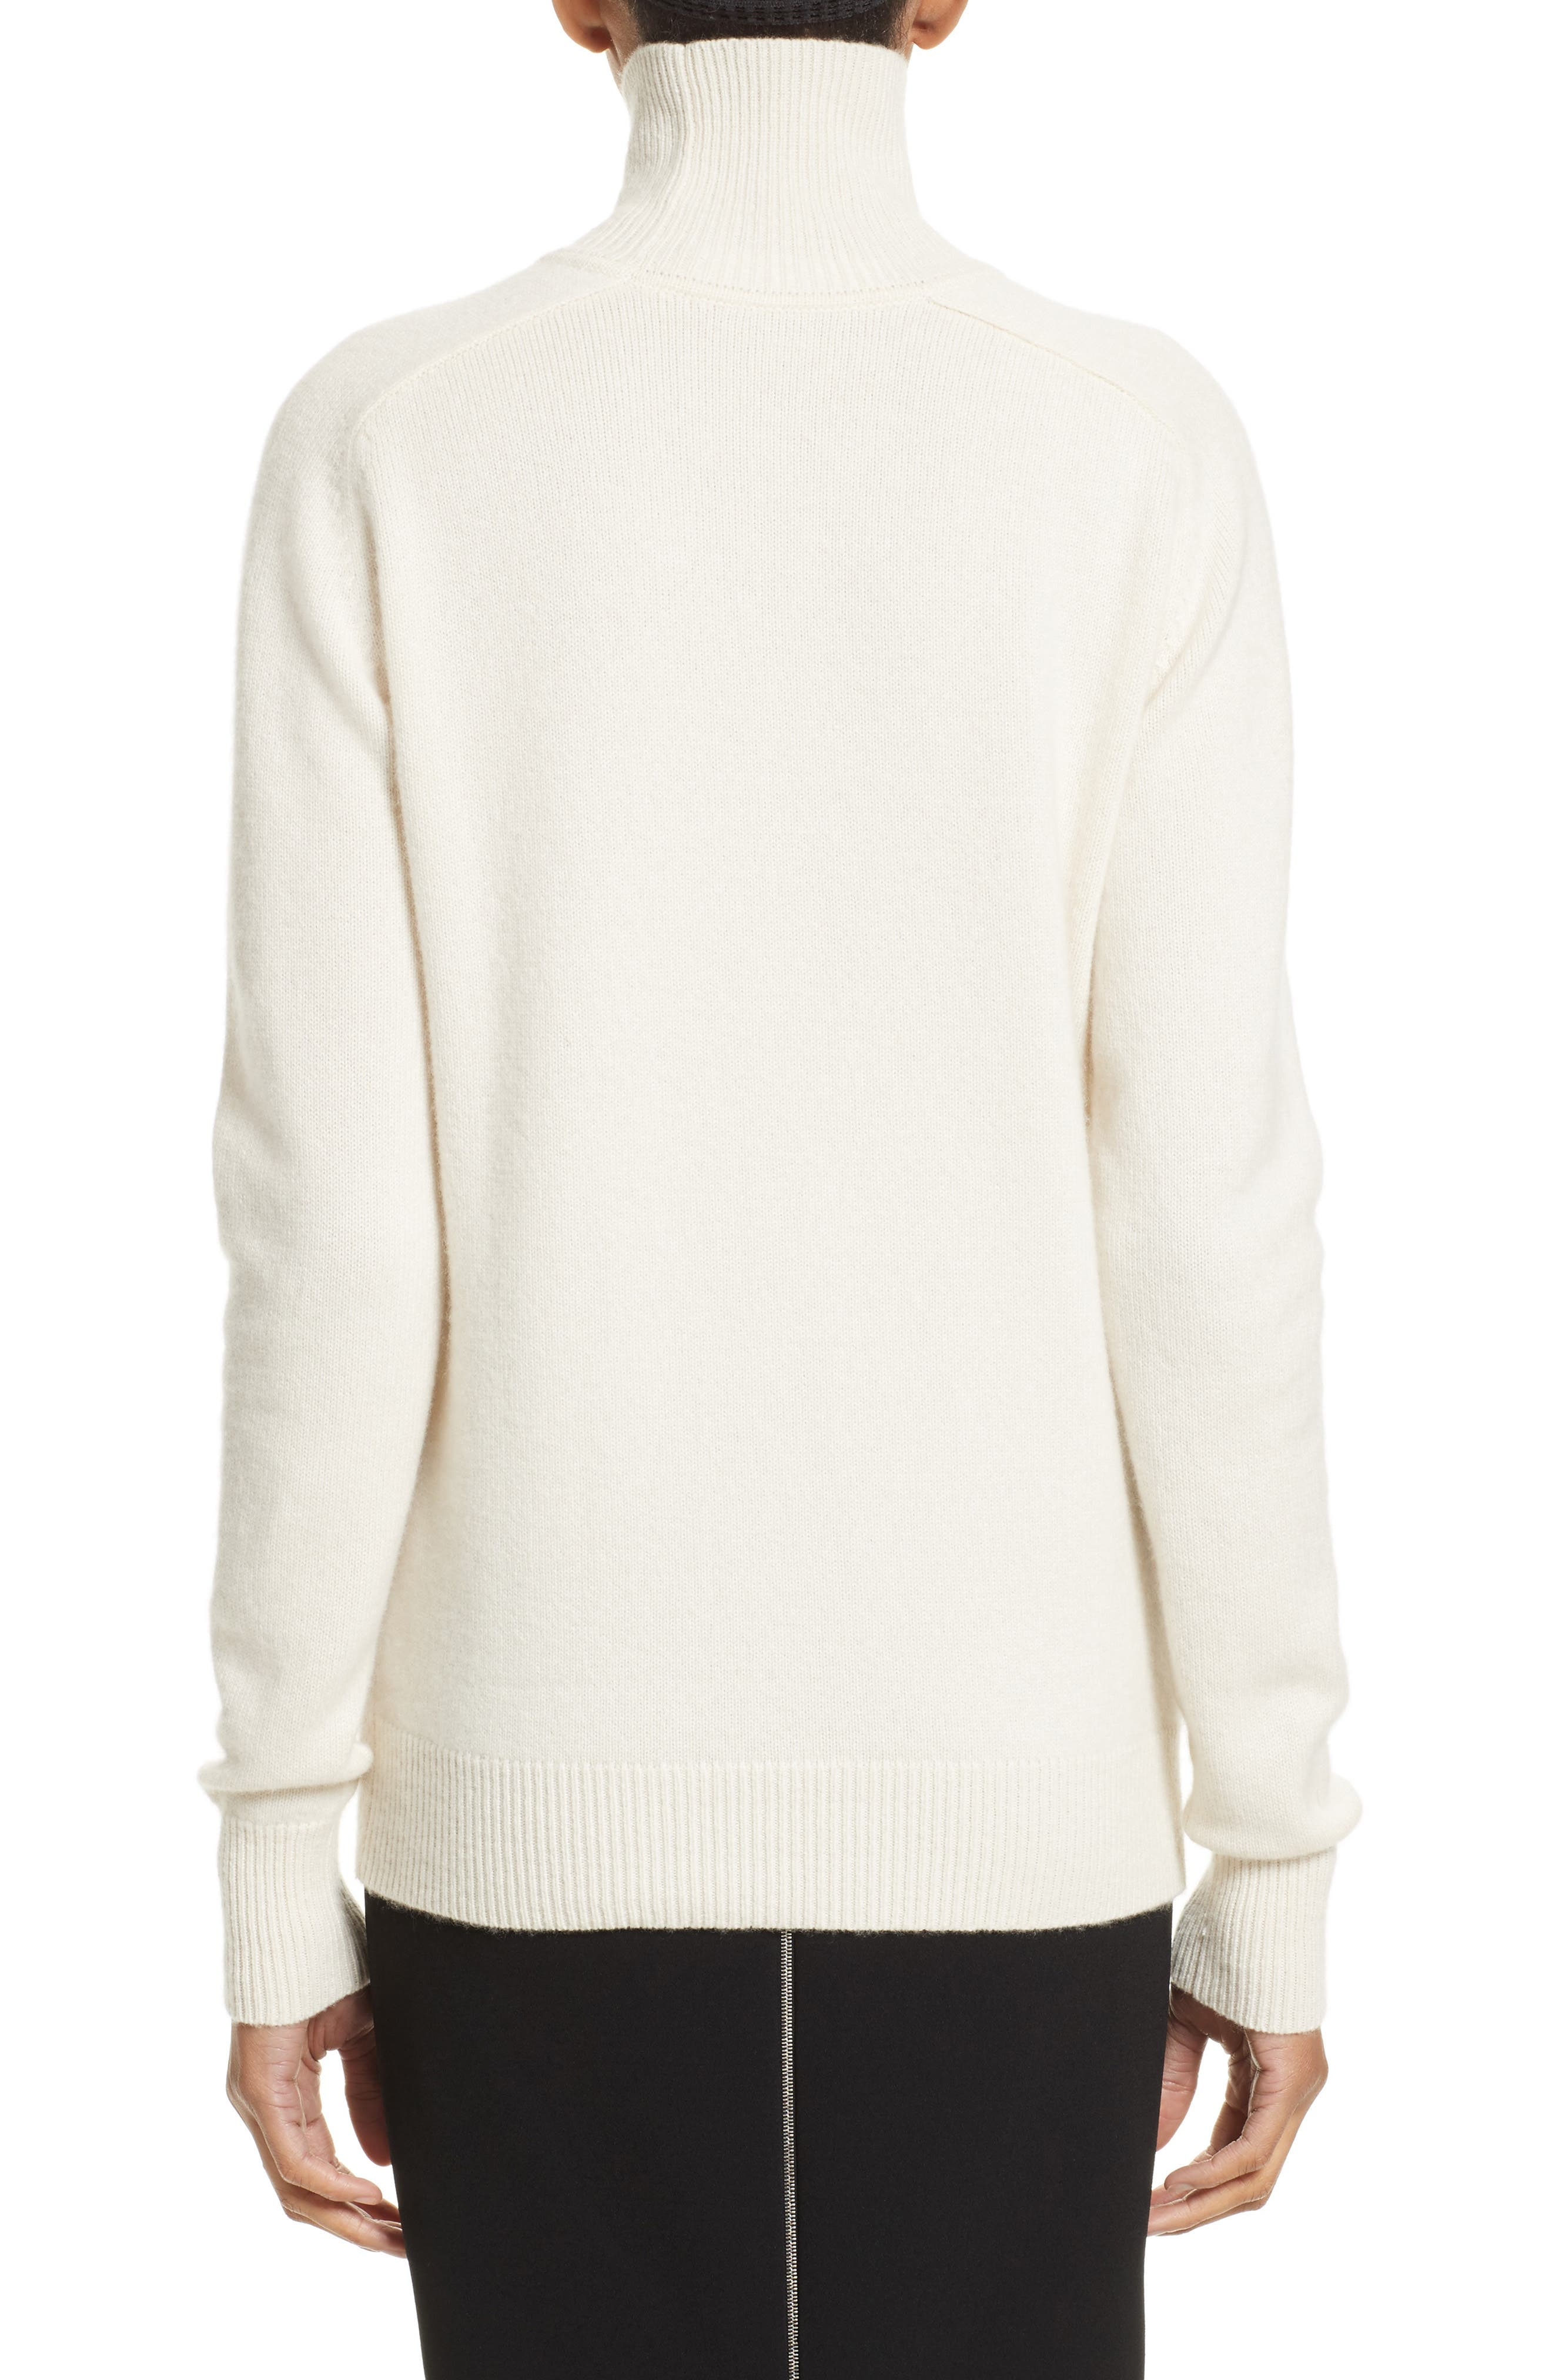 VICTORIA BECKHAM, Cashmere Turtleneck Sweater, Alternate thumbnail 2, color, VANILLA